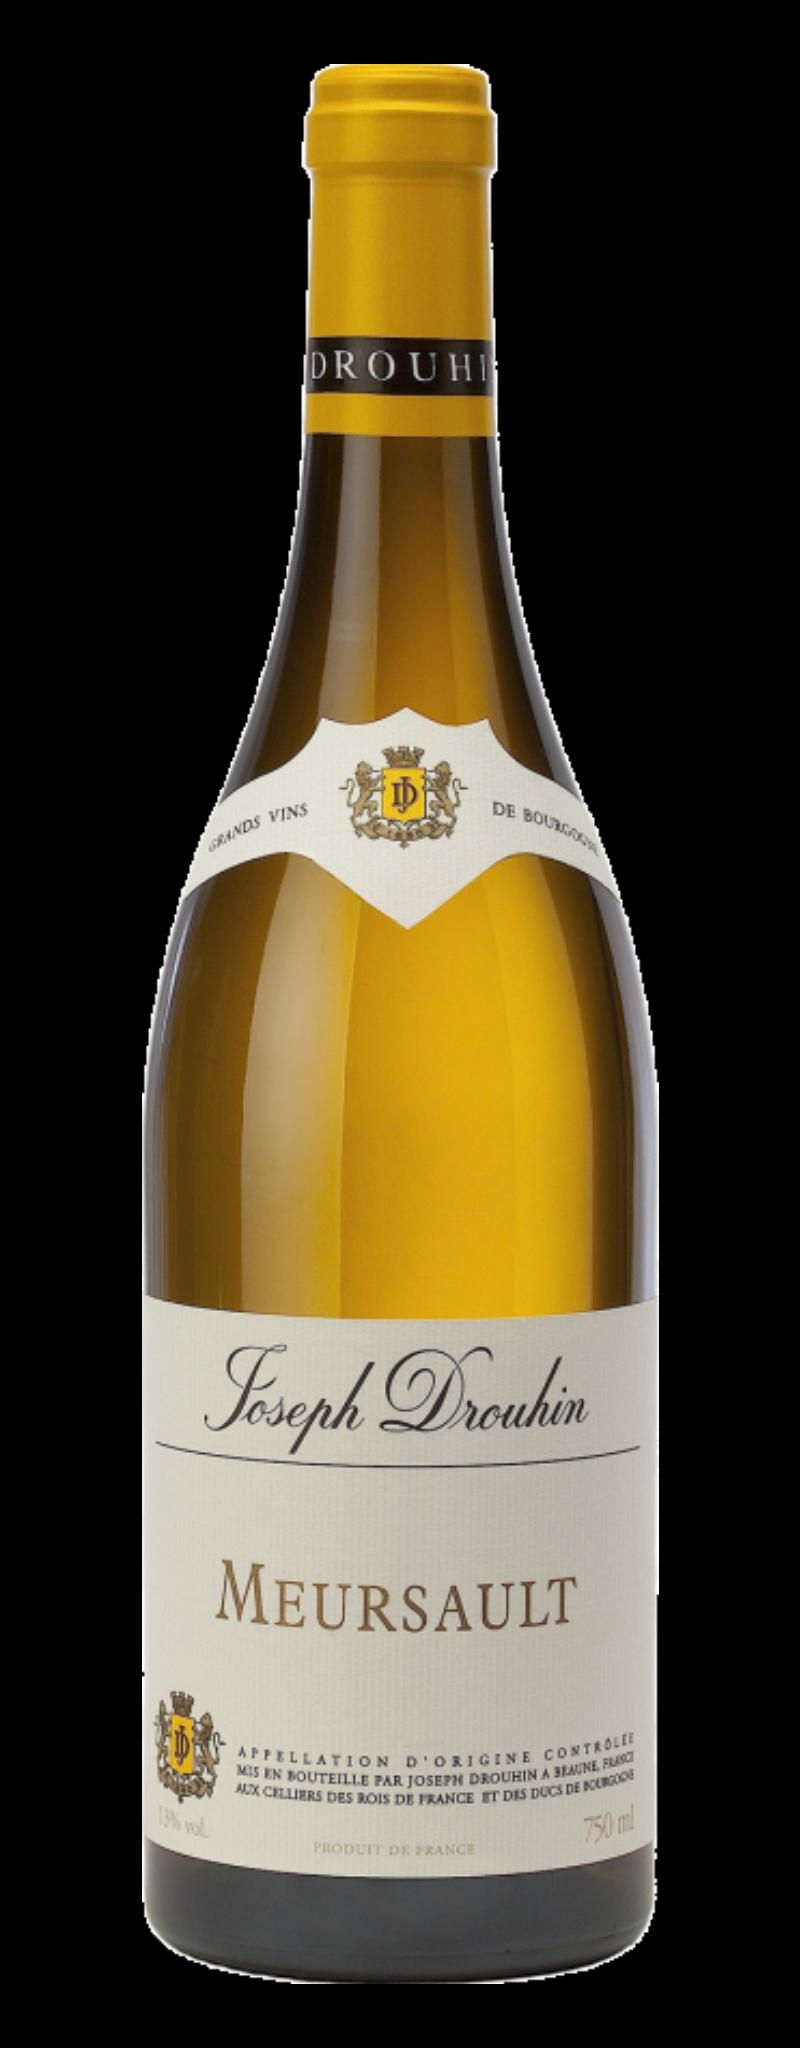 Joseph Drouhin - Meursault  - 750ml